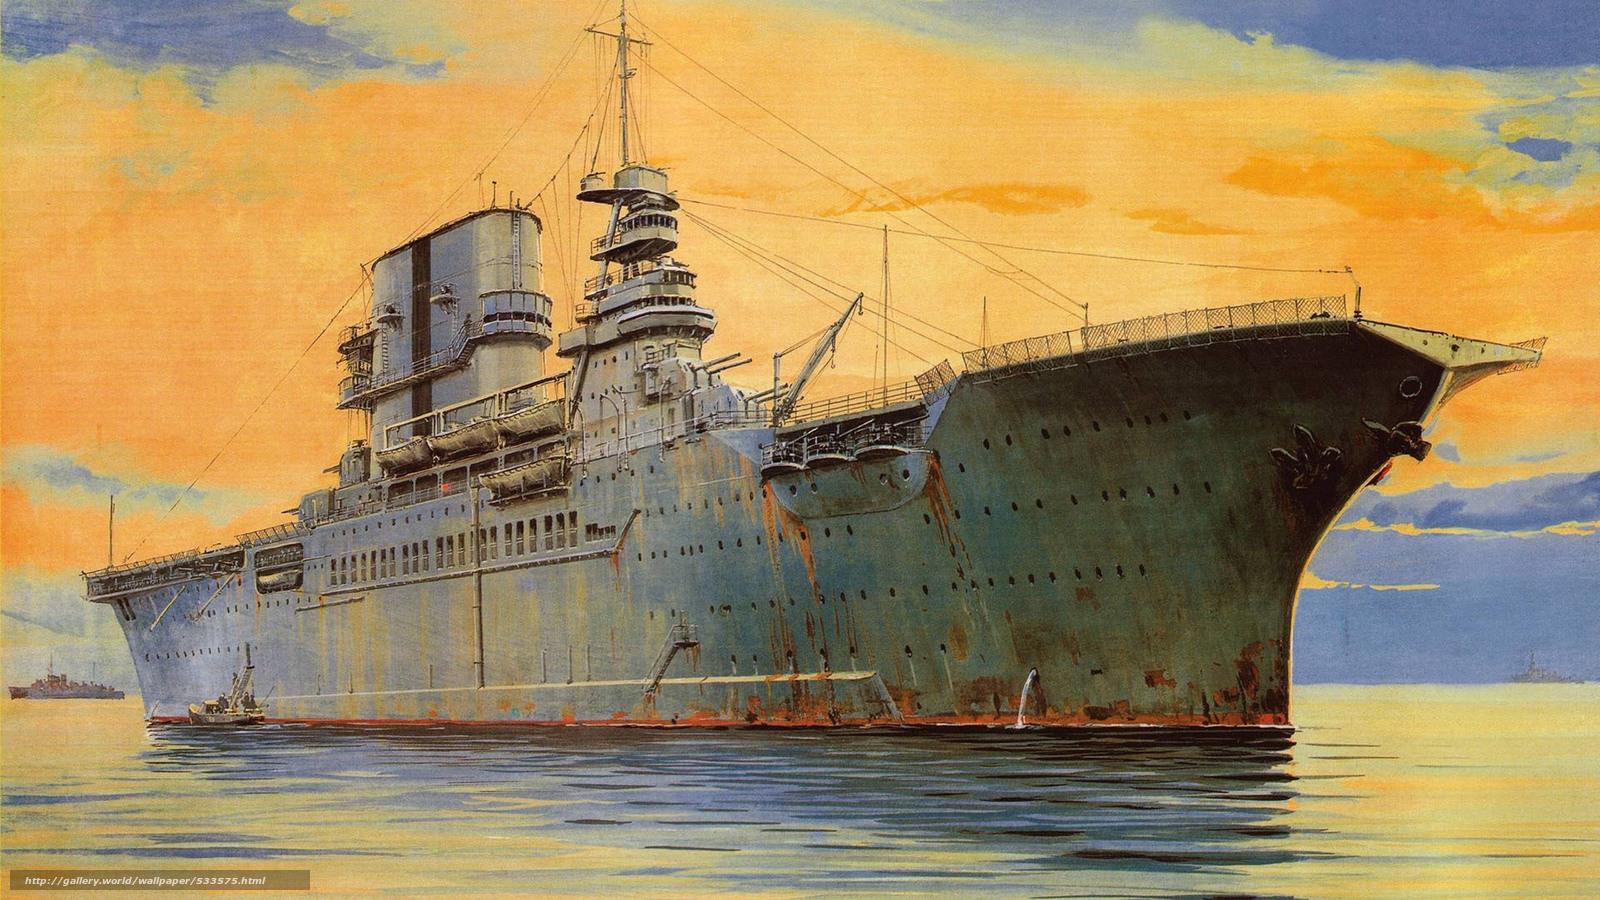 navy wallpaper 1440x900 ships - photo #45